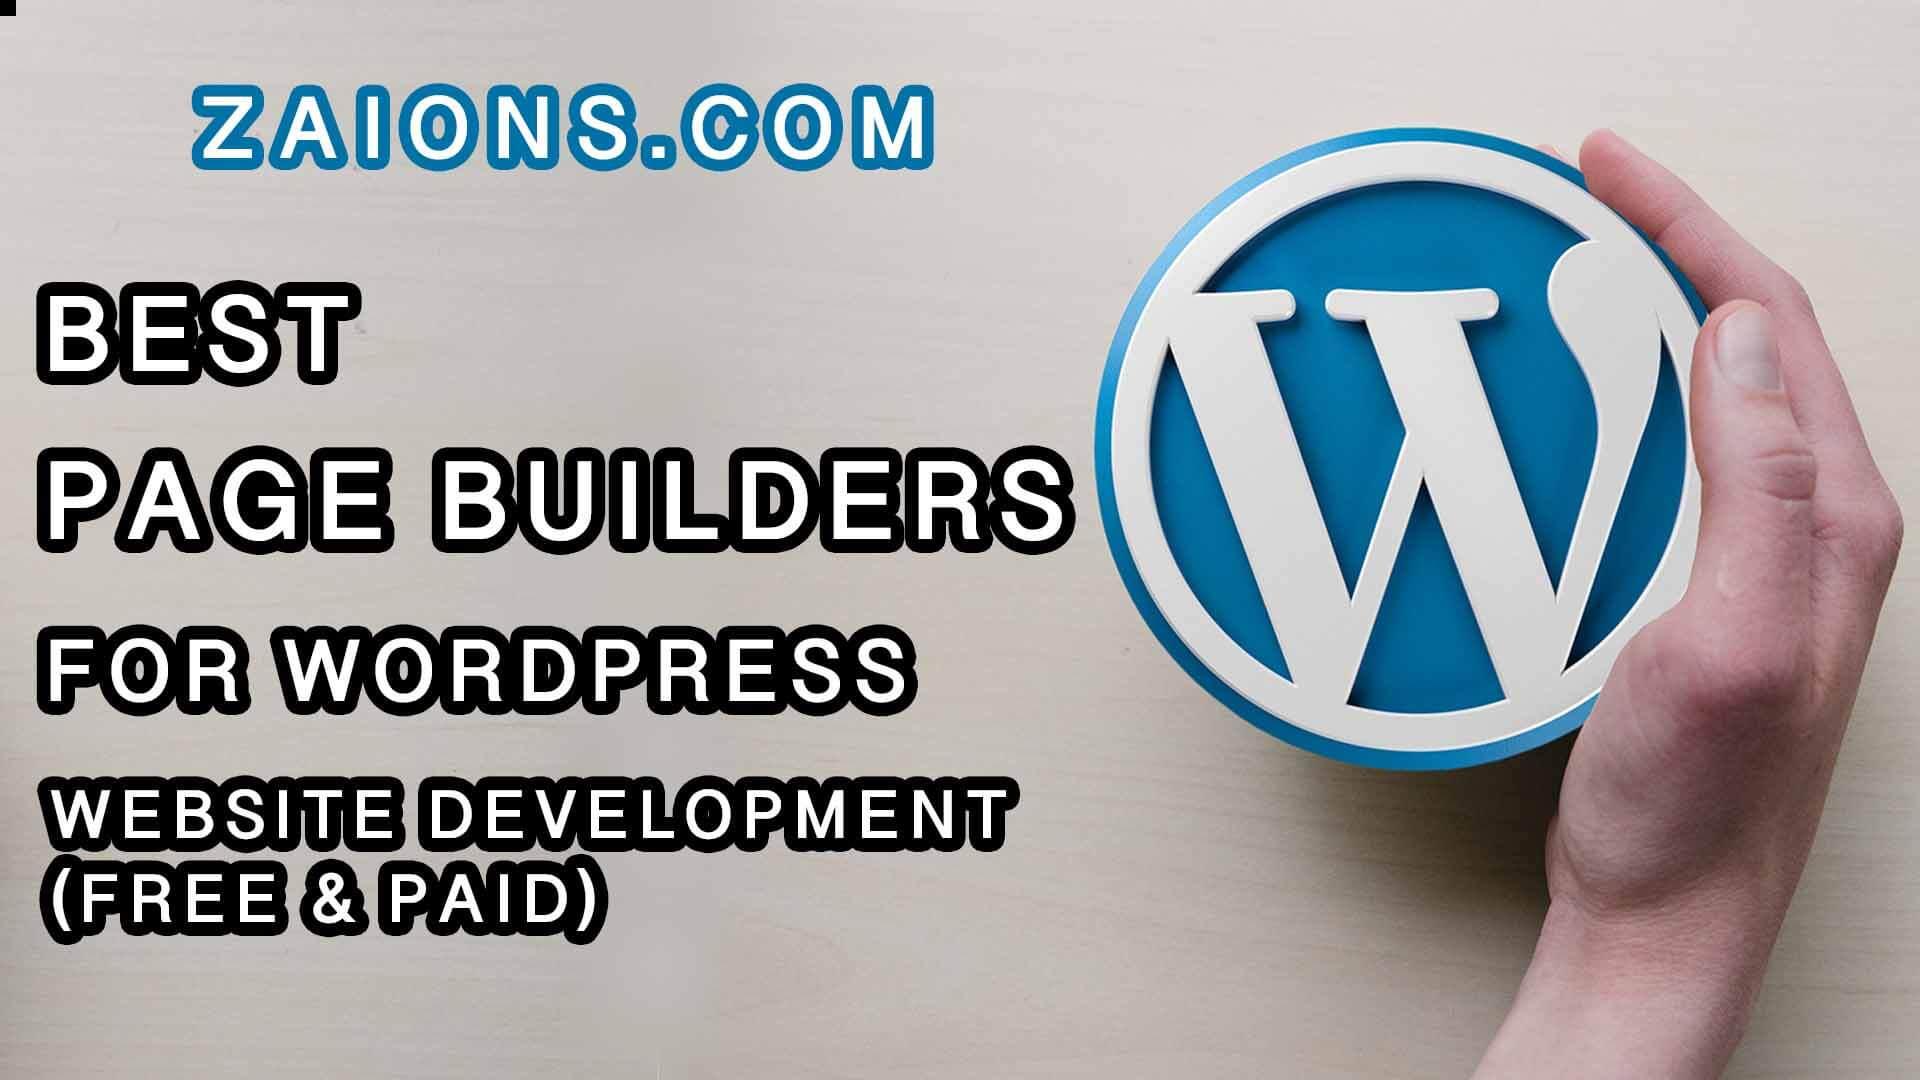 best page builders for wordpress development